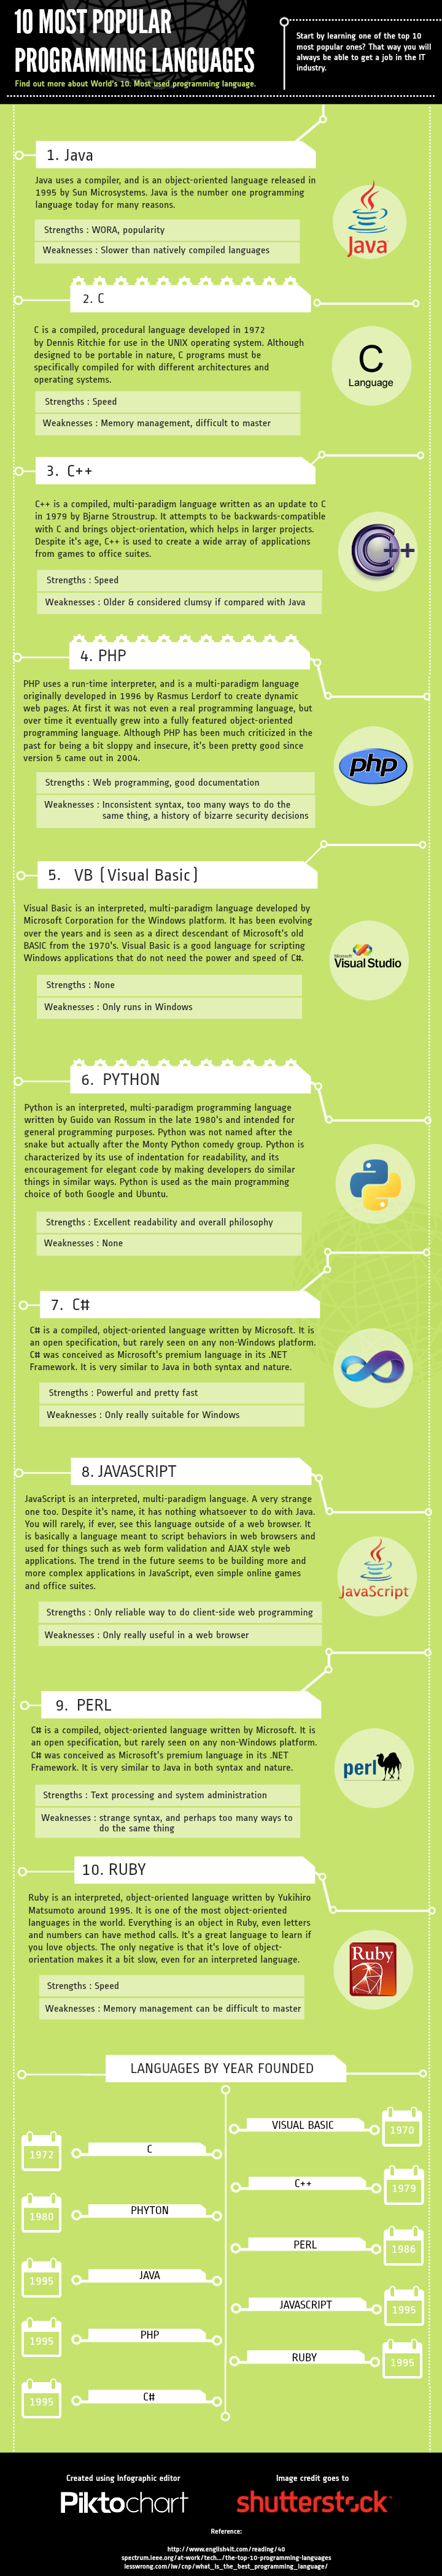 Most-Popular-Programming-Languages